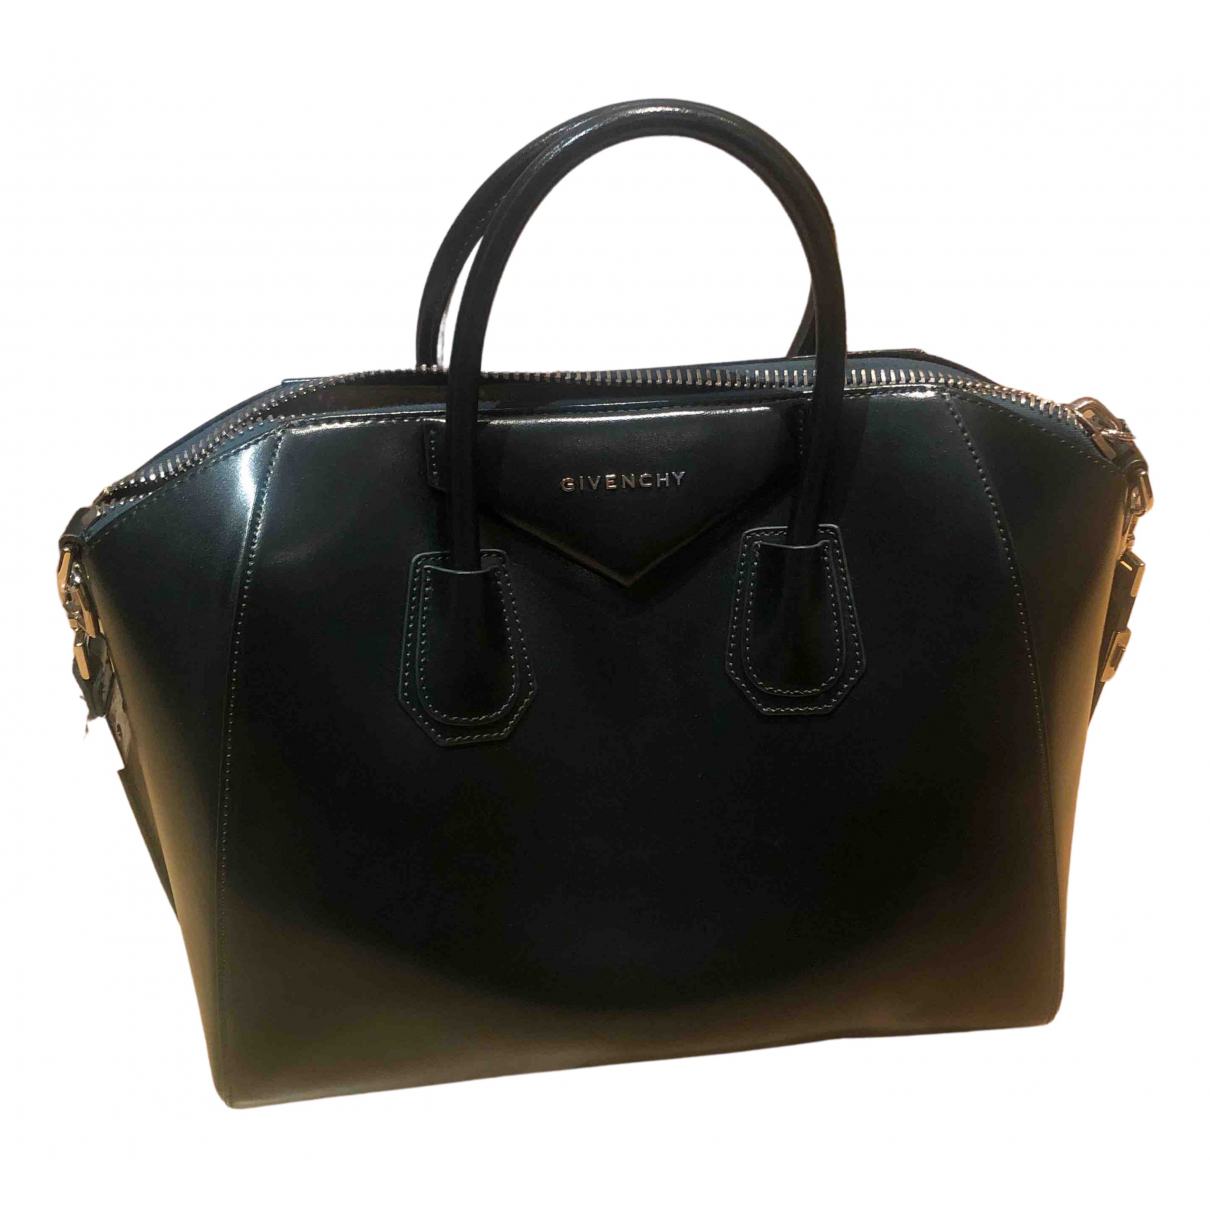 Givenchy - Sac a main Antigona pour femme en cuir - vert